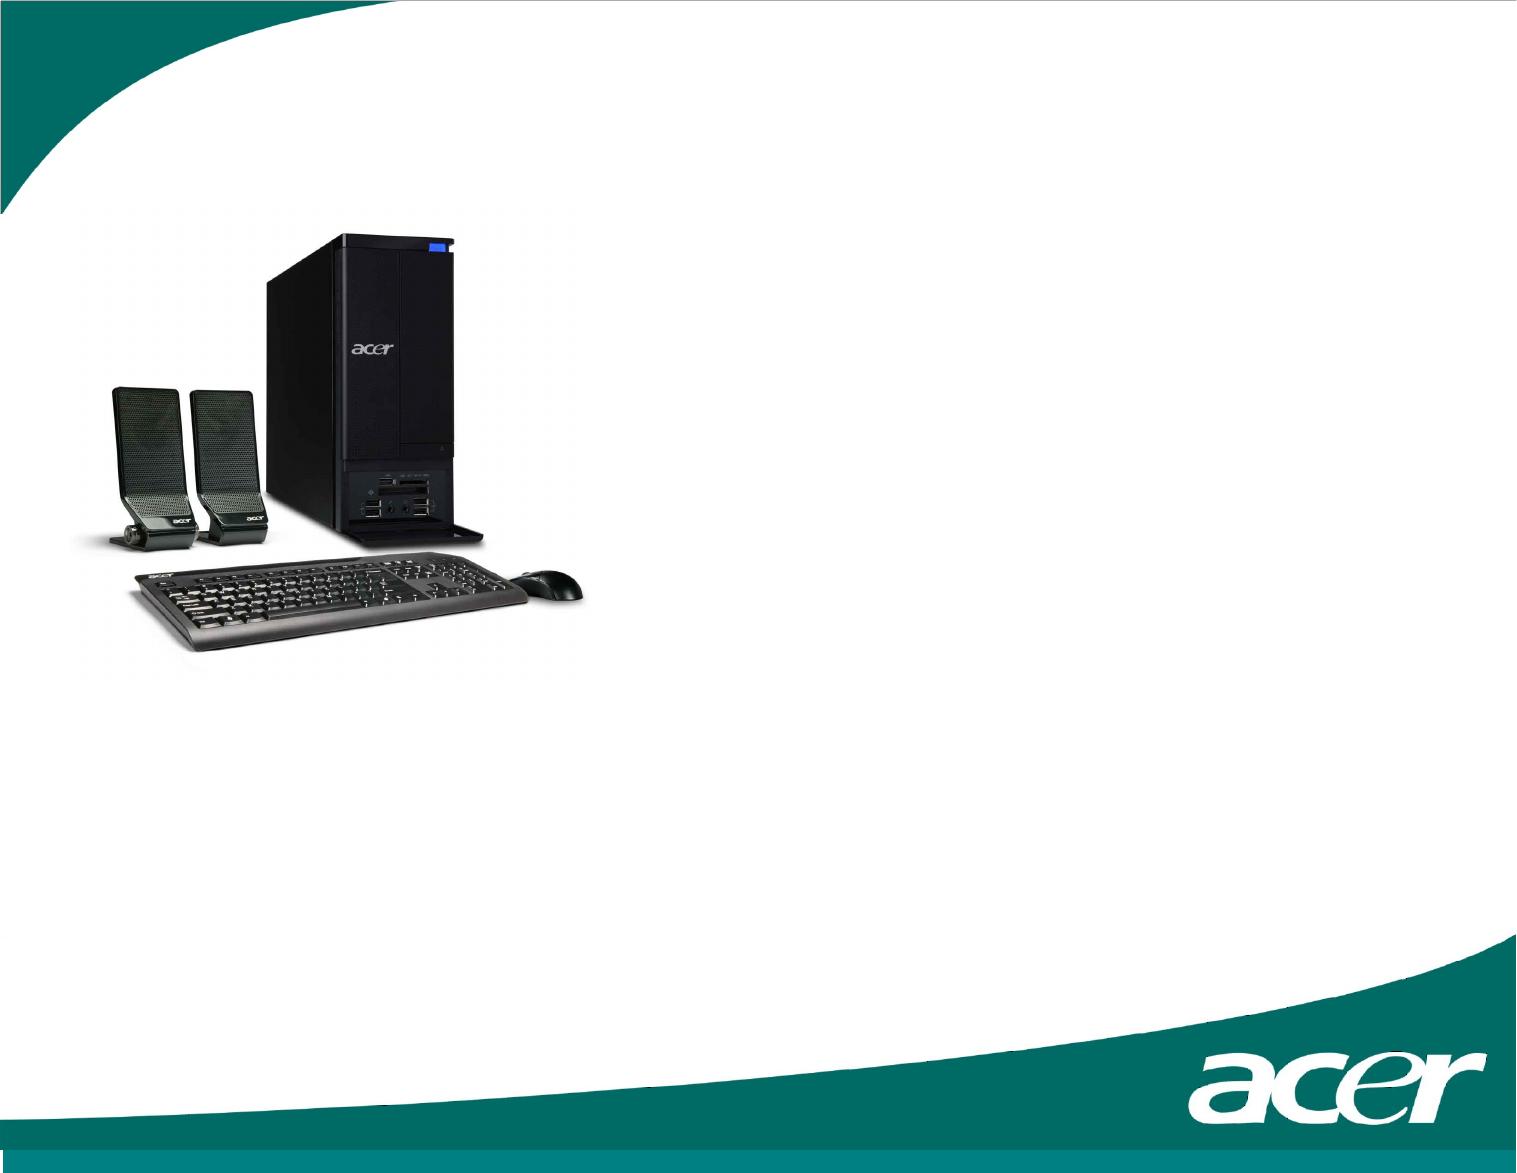 acer ax3400g u4802 desktop v1 1 wmx aspire x3400 0009980207732 rh usermanual wiki